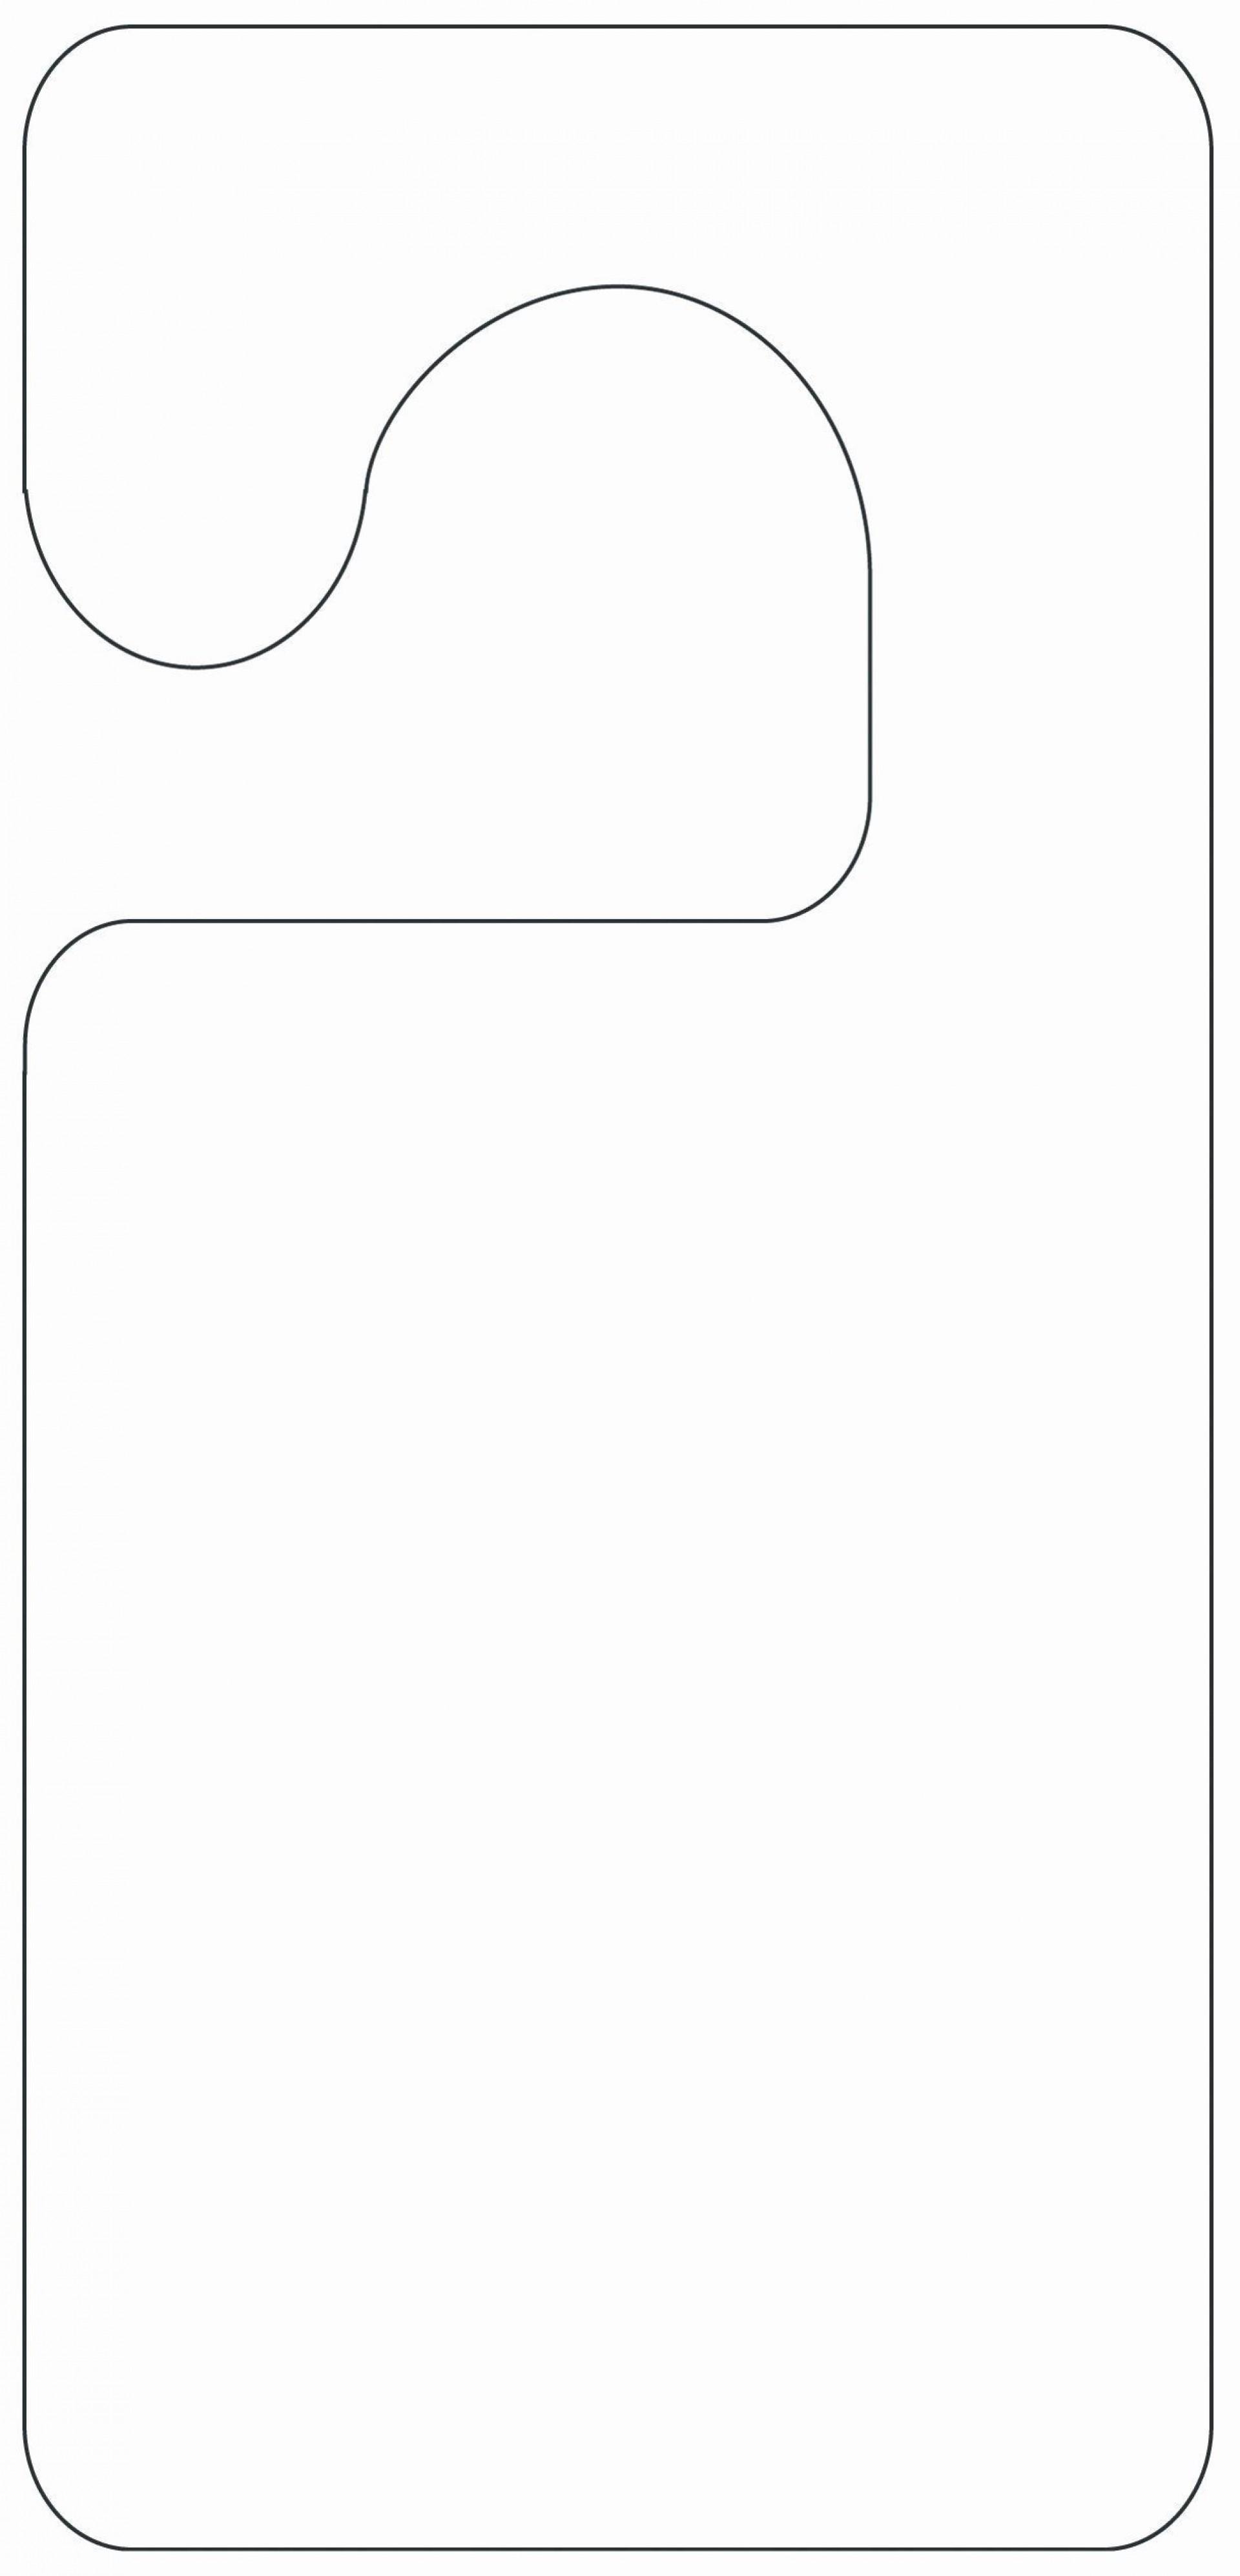 002 Wondrou Free Printable Template For Door Hanger Sample 1920